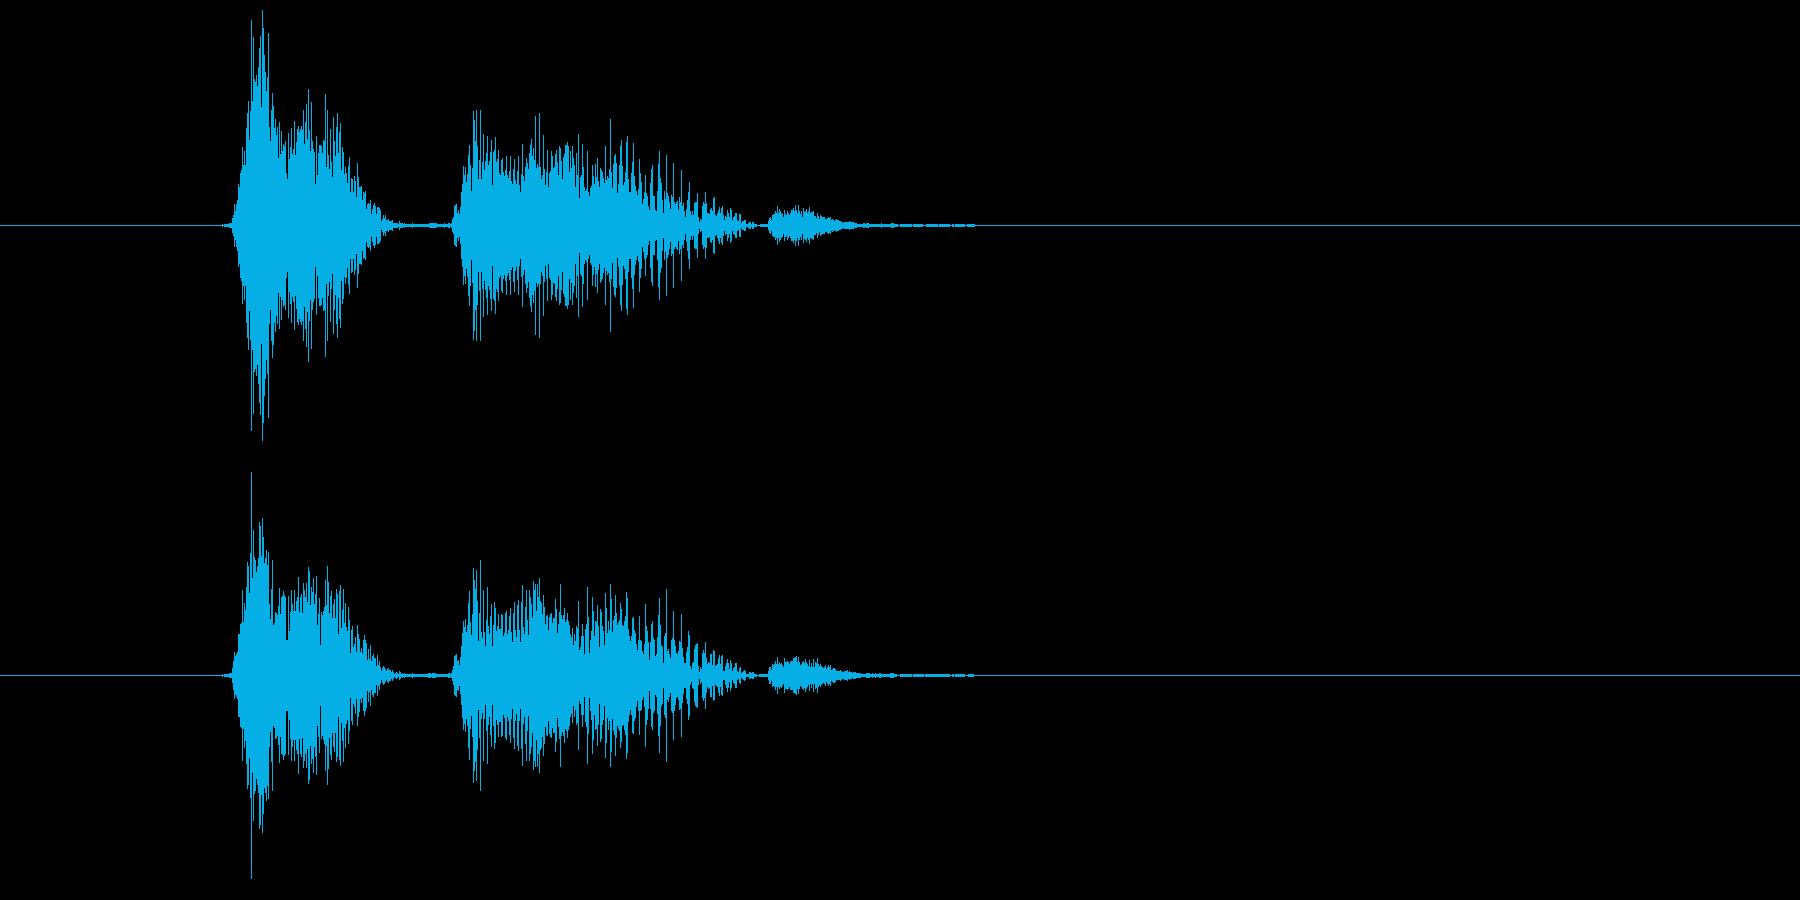 Check pointの再生済みの波形